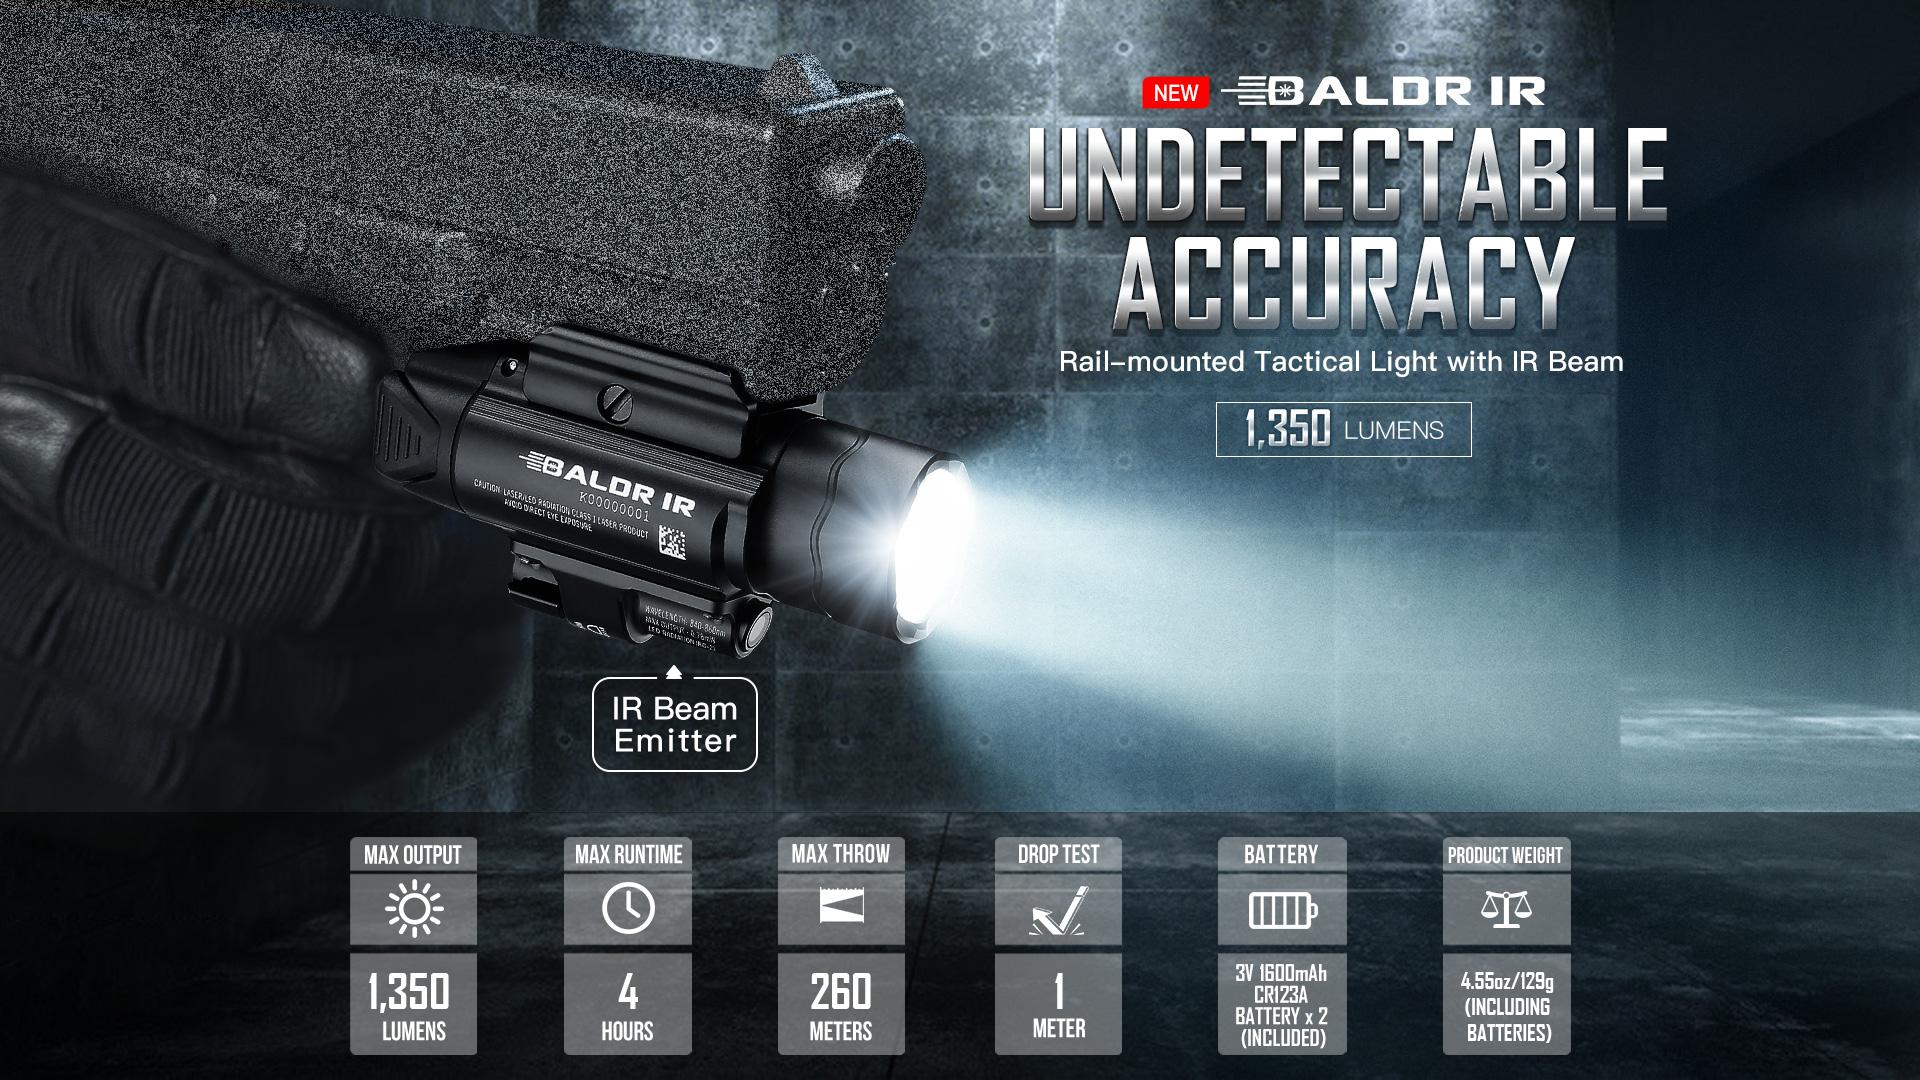 Baldr IR rechargeable tactical light